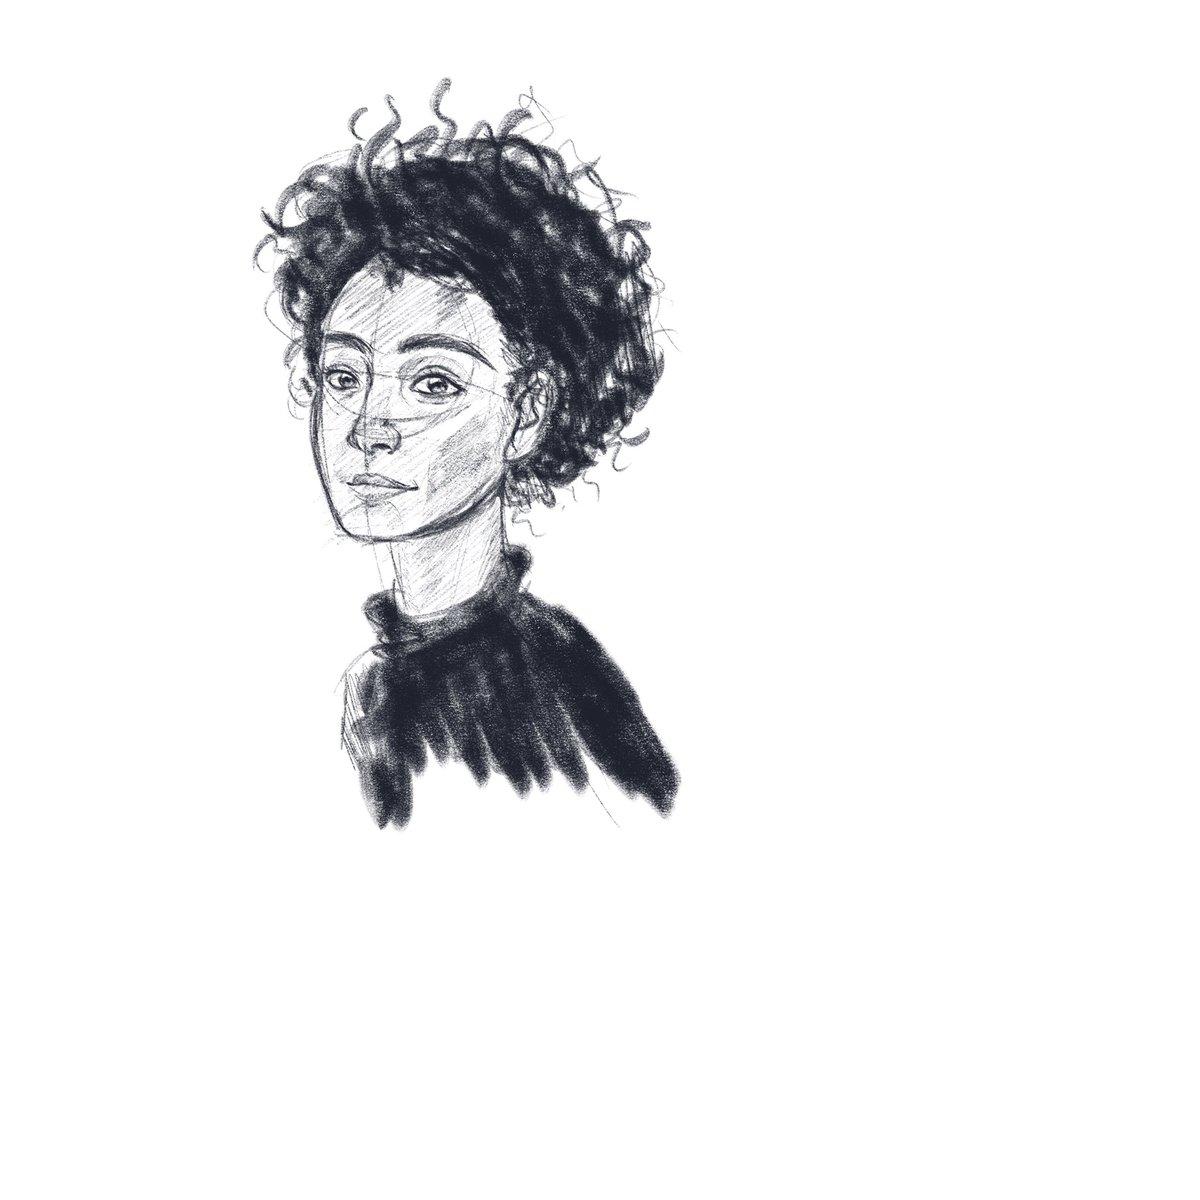 Warm-up sketch! #portraits pic.twitter.com/RLi10WWoxY